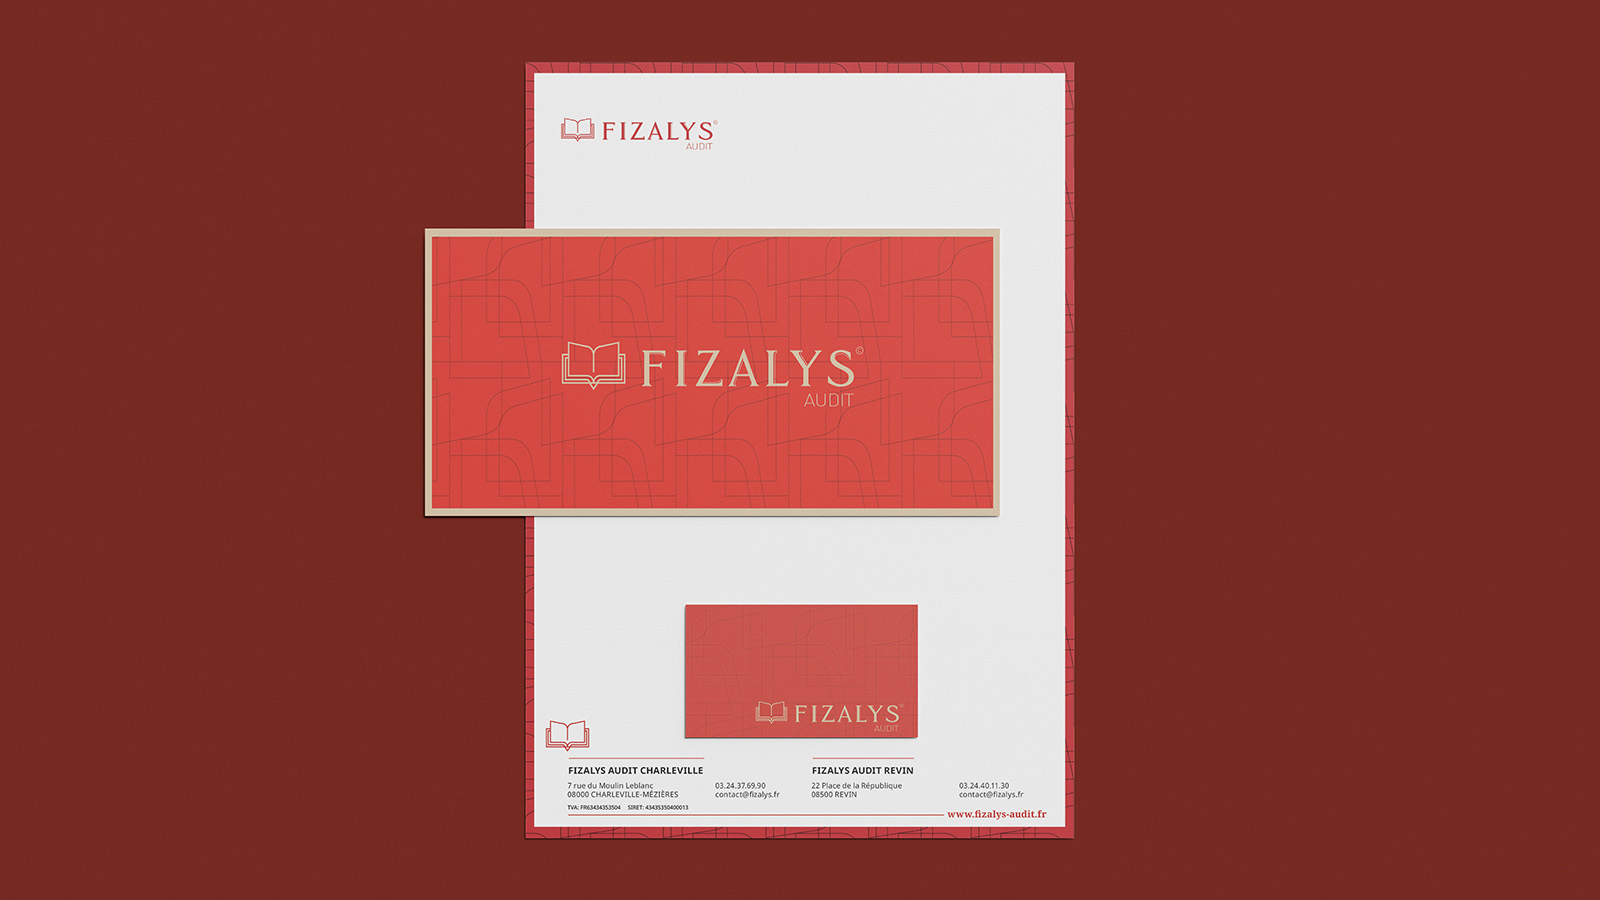 Papeterie - Fizalys Audit